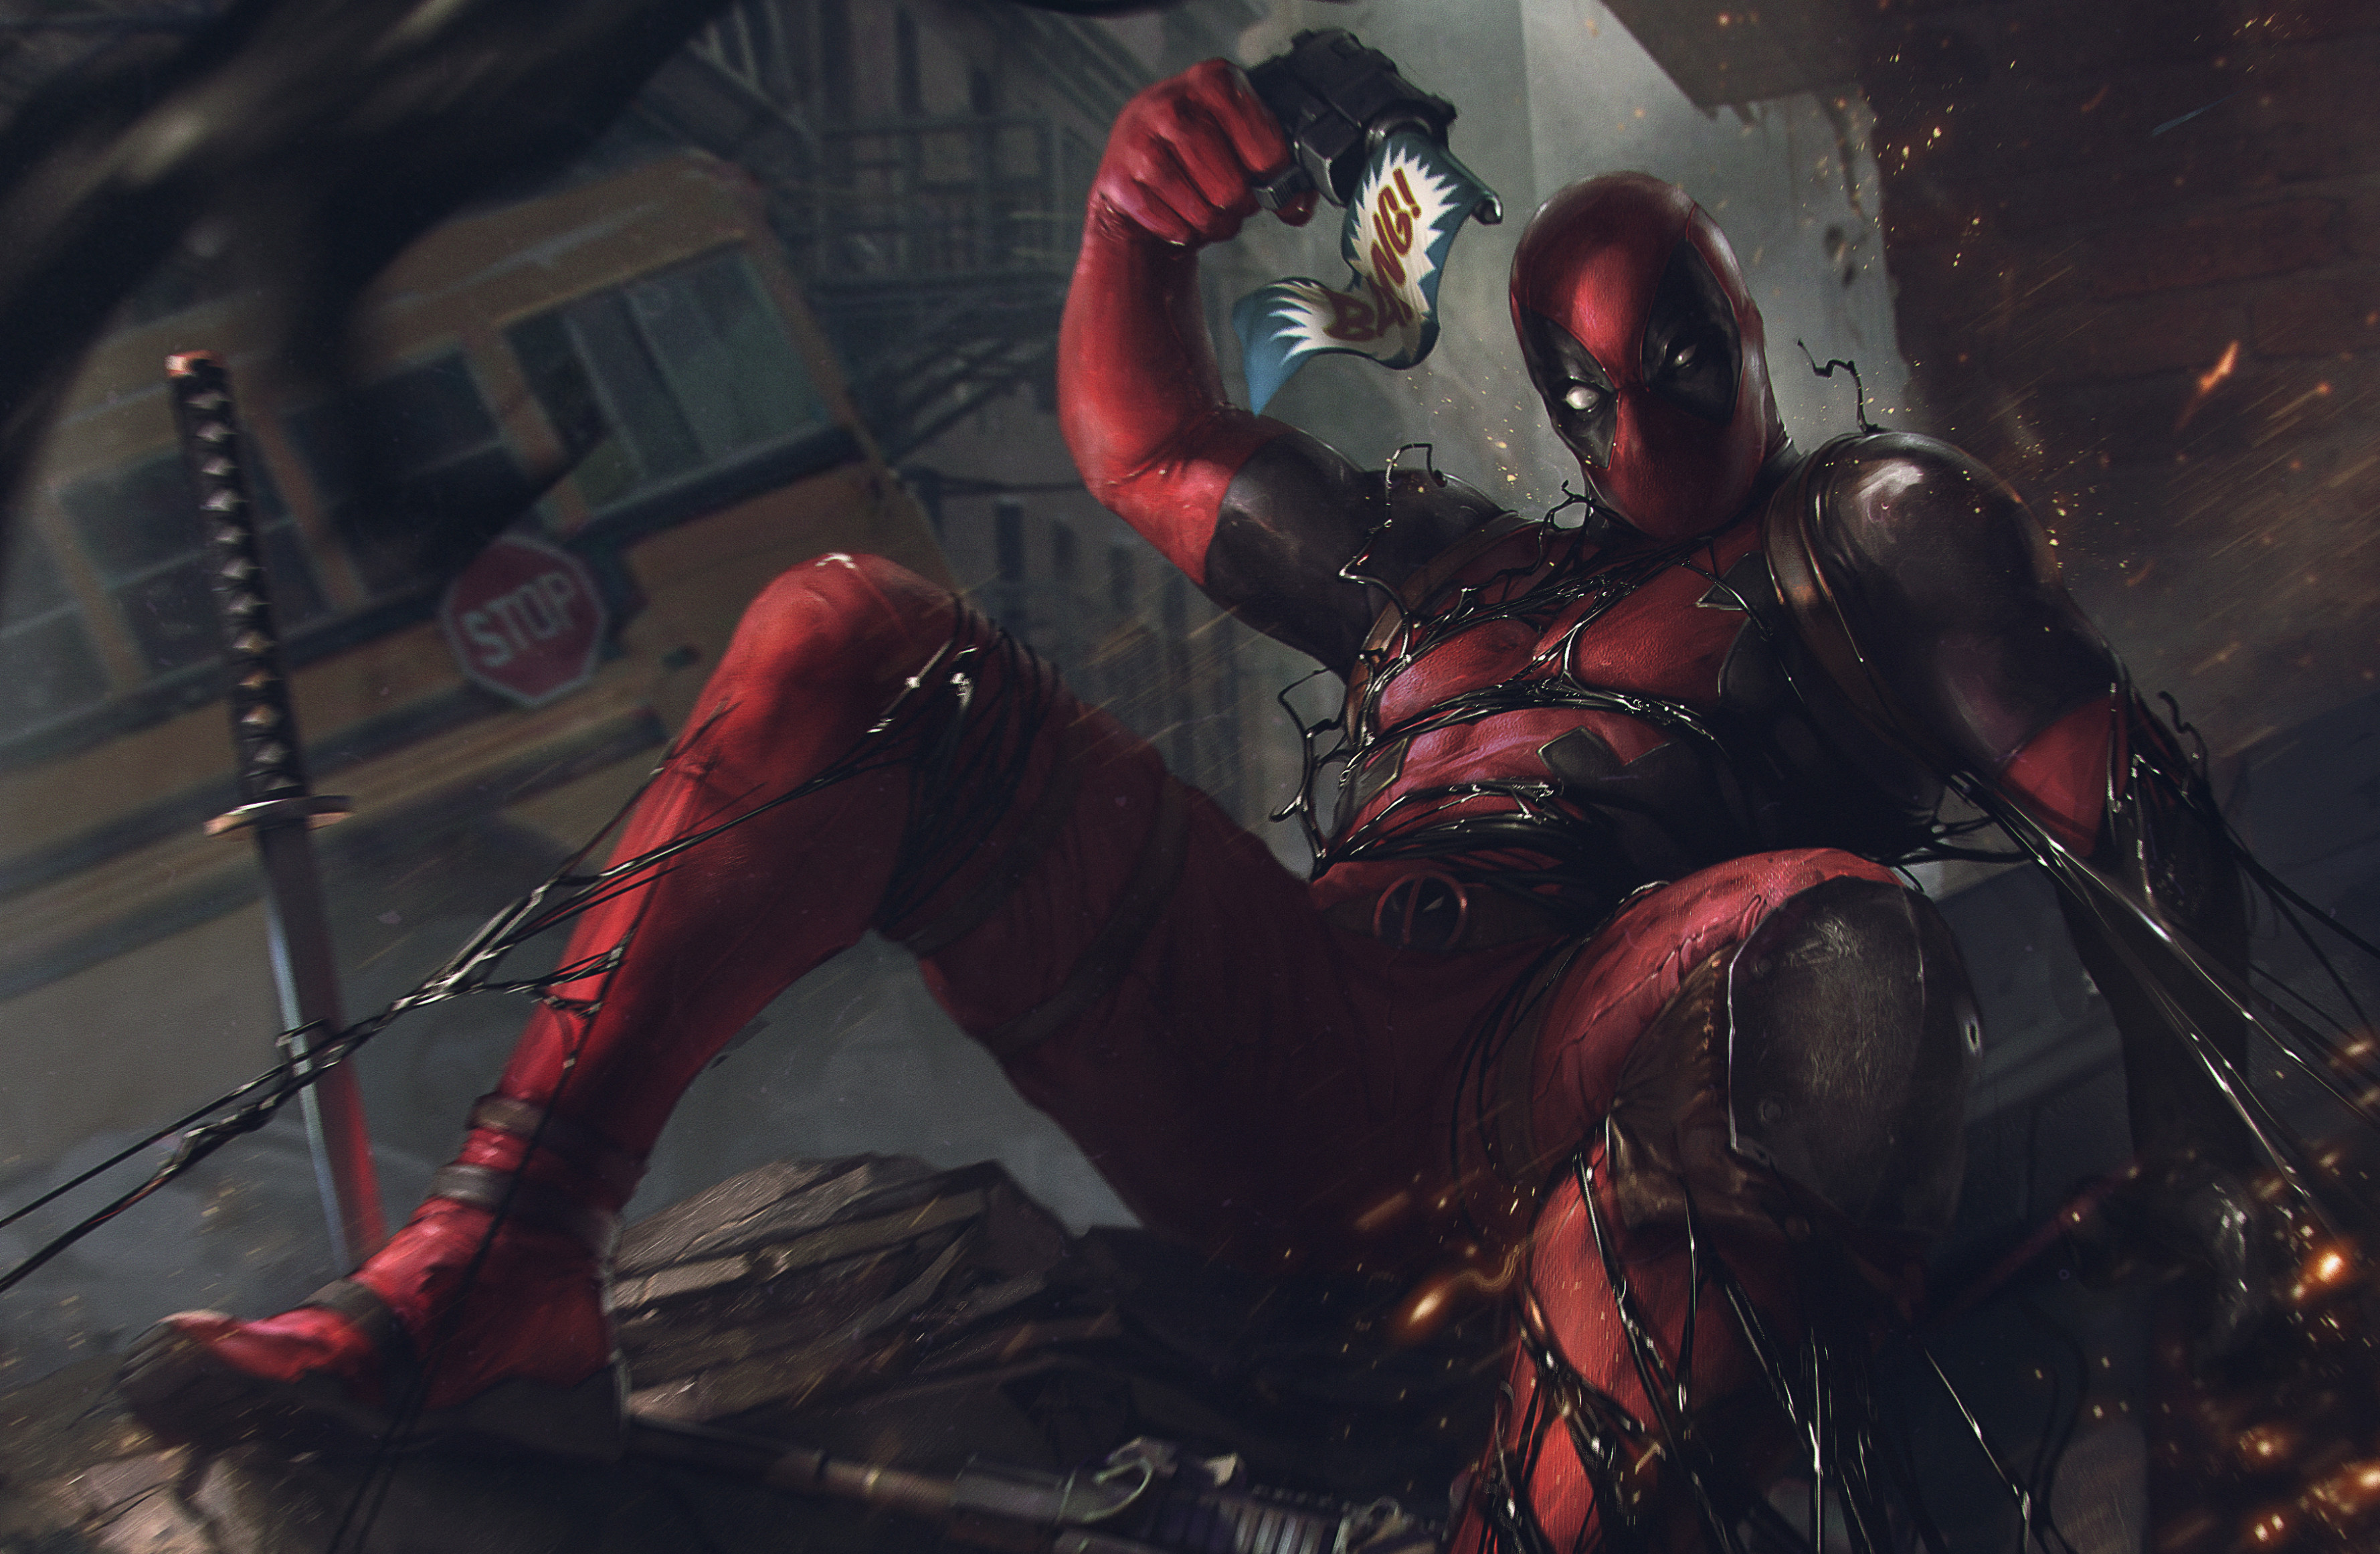 General 3557x2322 artwork digital art digital painting fan art Deadpool Deadpool 2 Symbiote katana